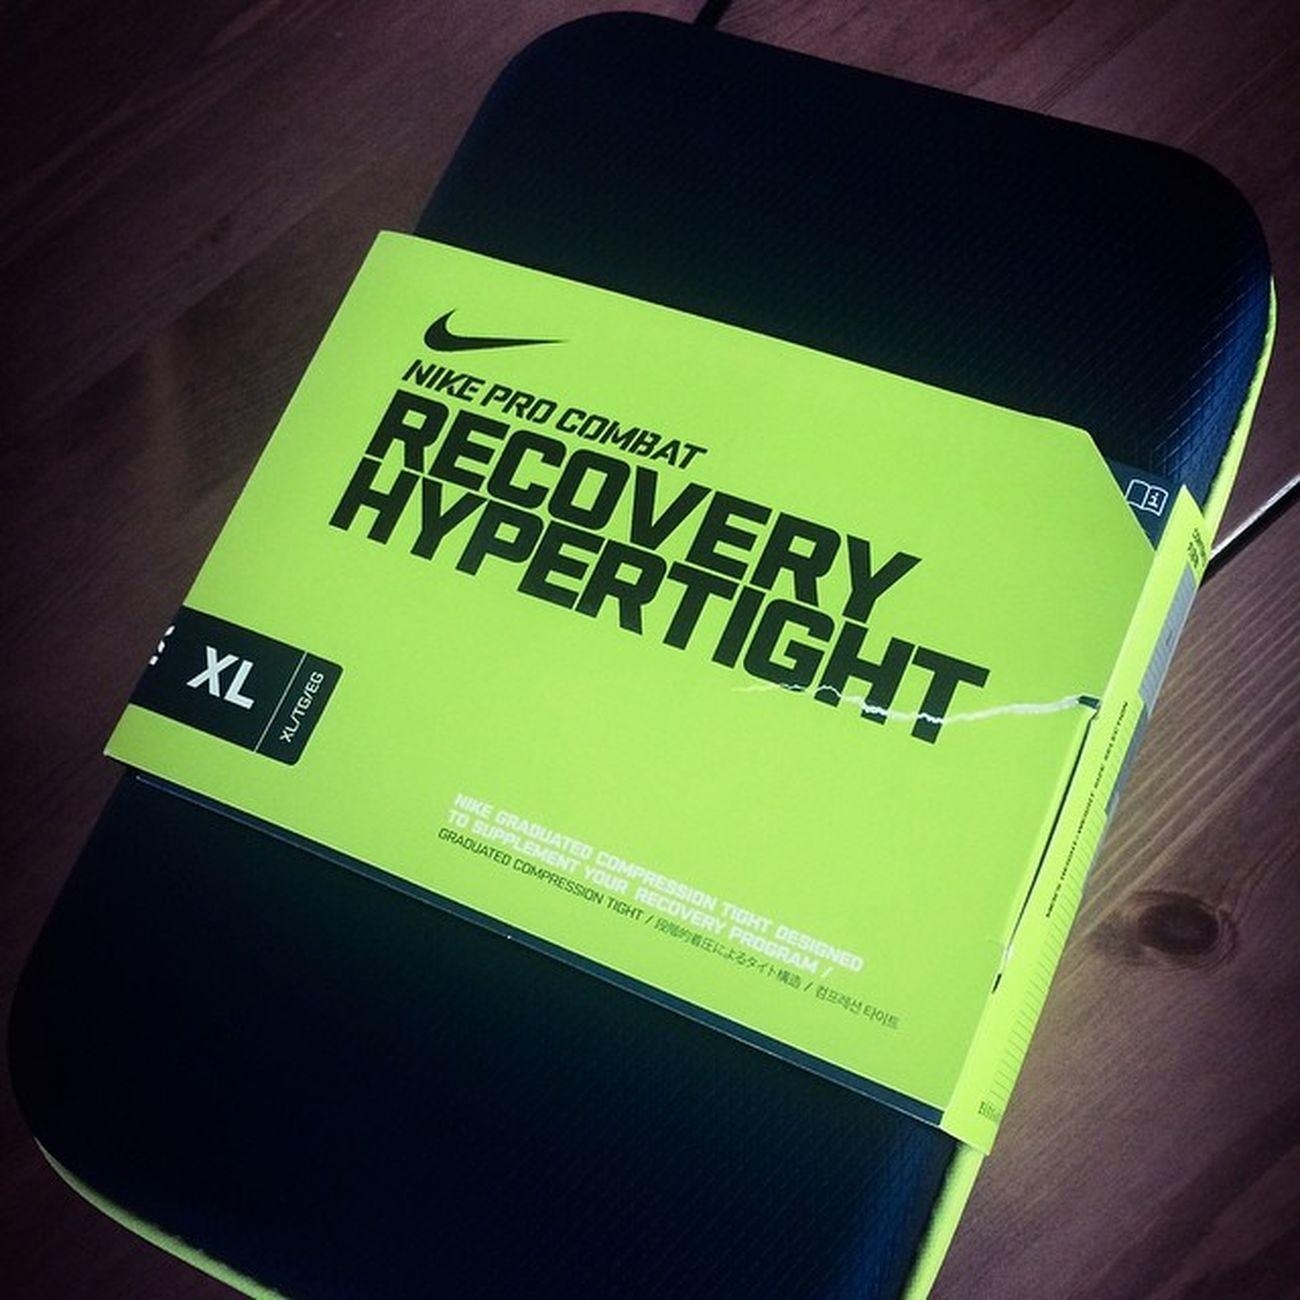 収穫祭!Nike Nikerecoveryheypertight 天王洲アイル